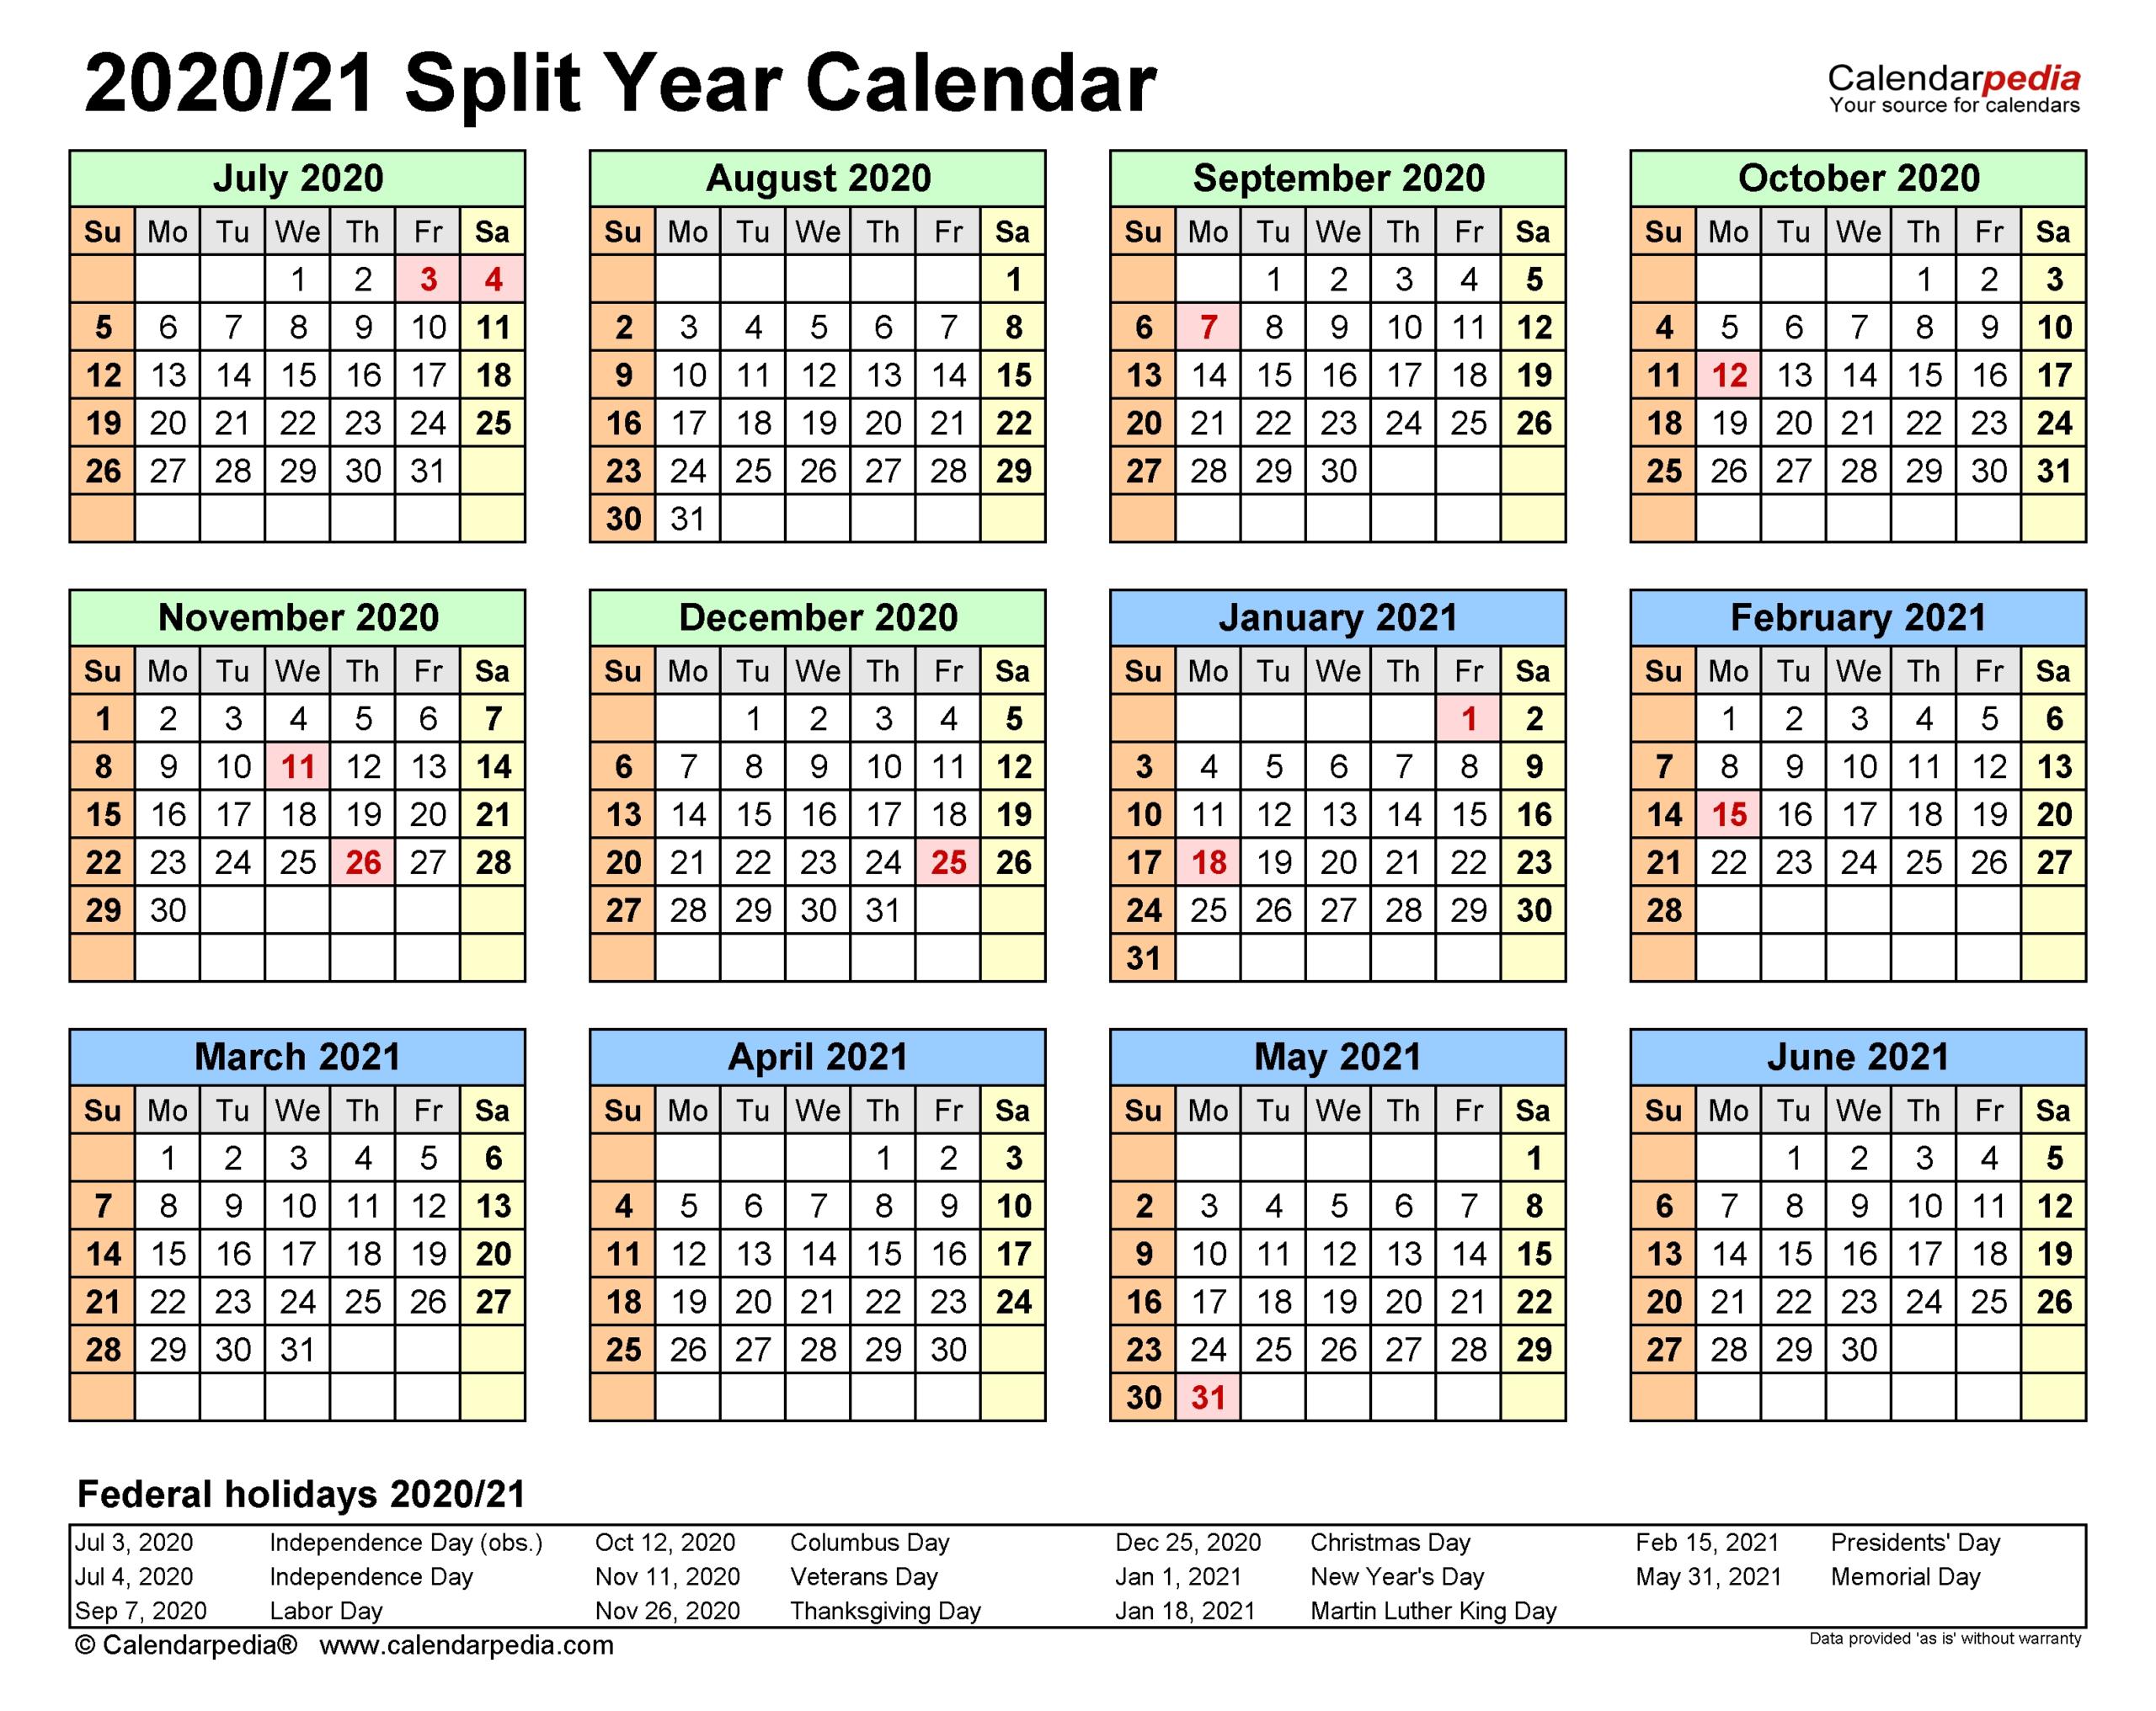 Depo Provera Calendar 2021 | Calendar Printables Free Blank  Depo Provera Injection Schedule 2021